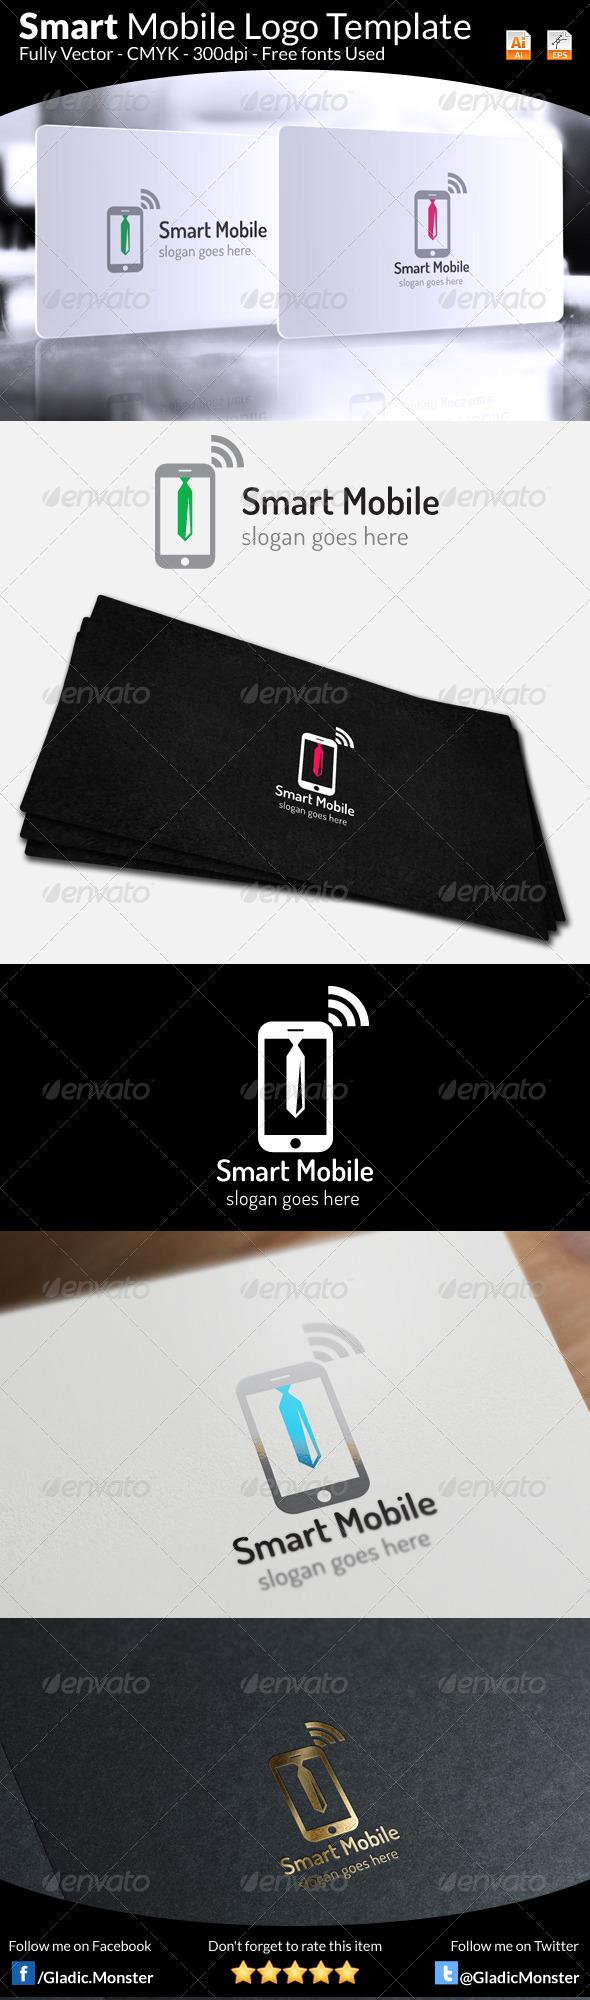 Smart Mobile Logo Template